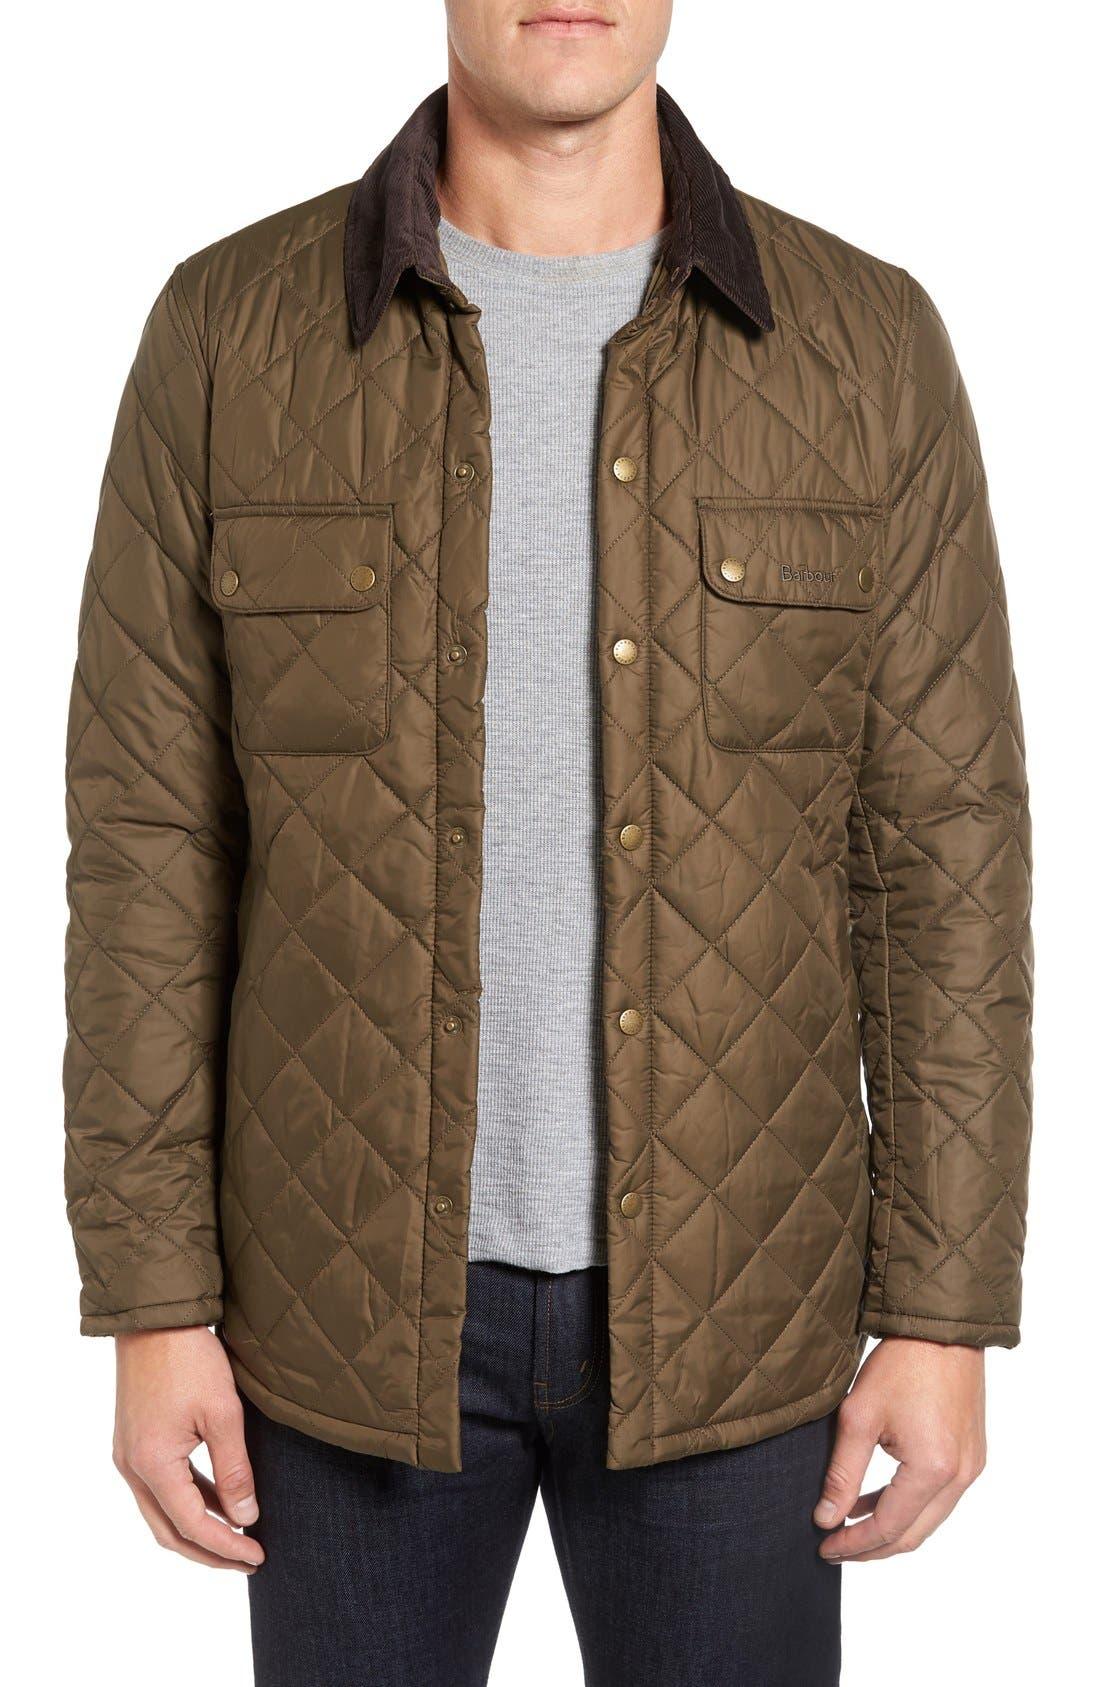 Main Image - Barbour 'Akenside' Quilted Jacket